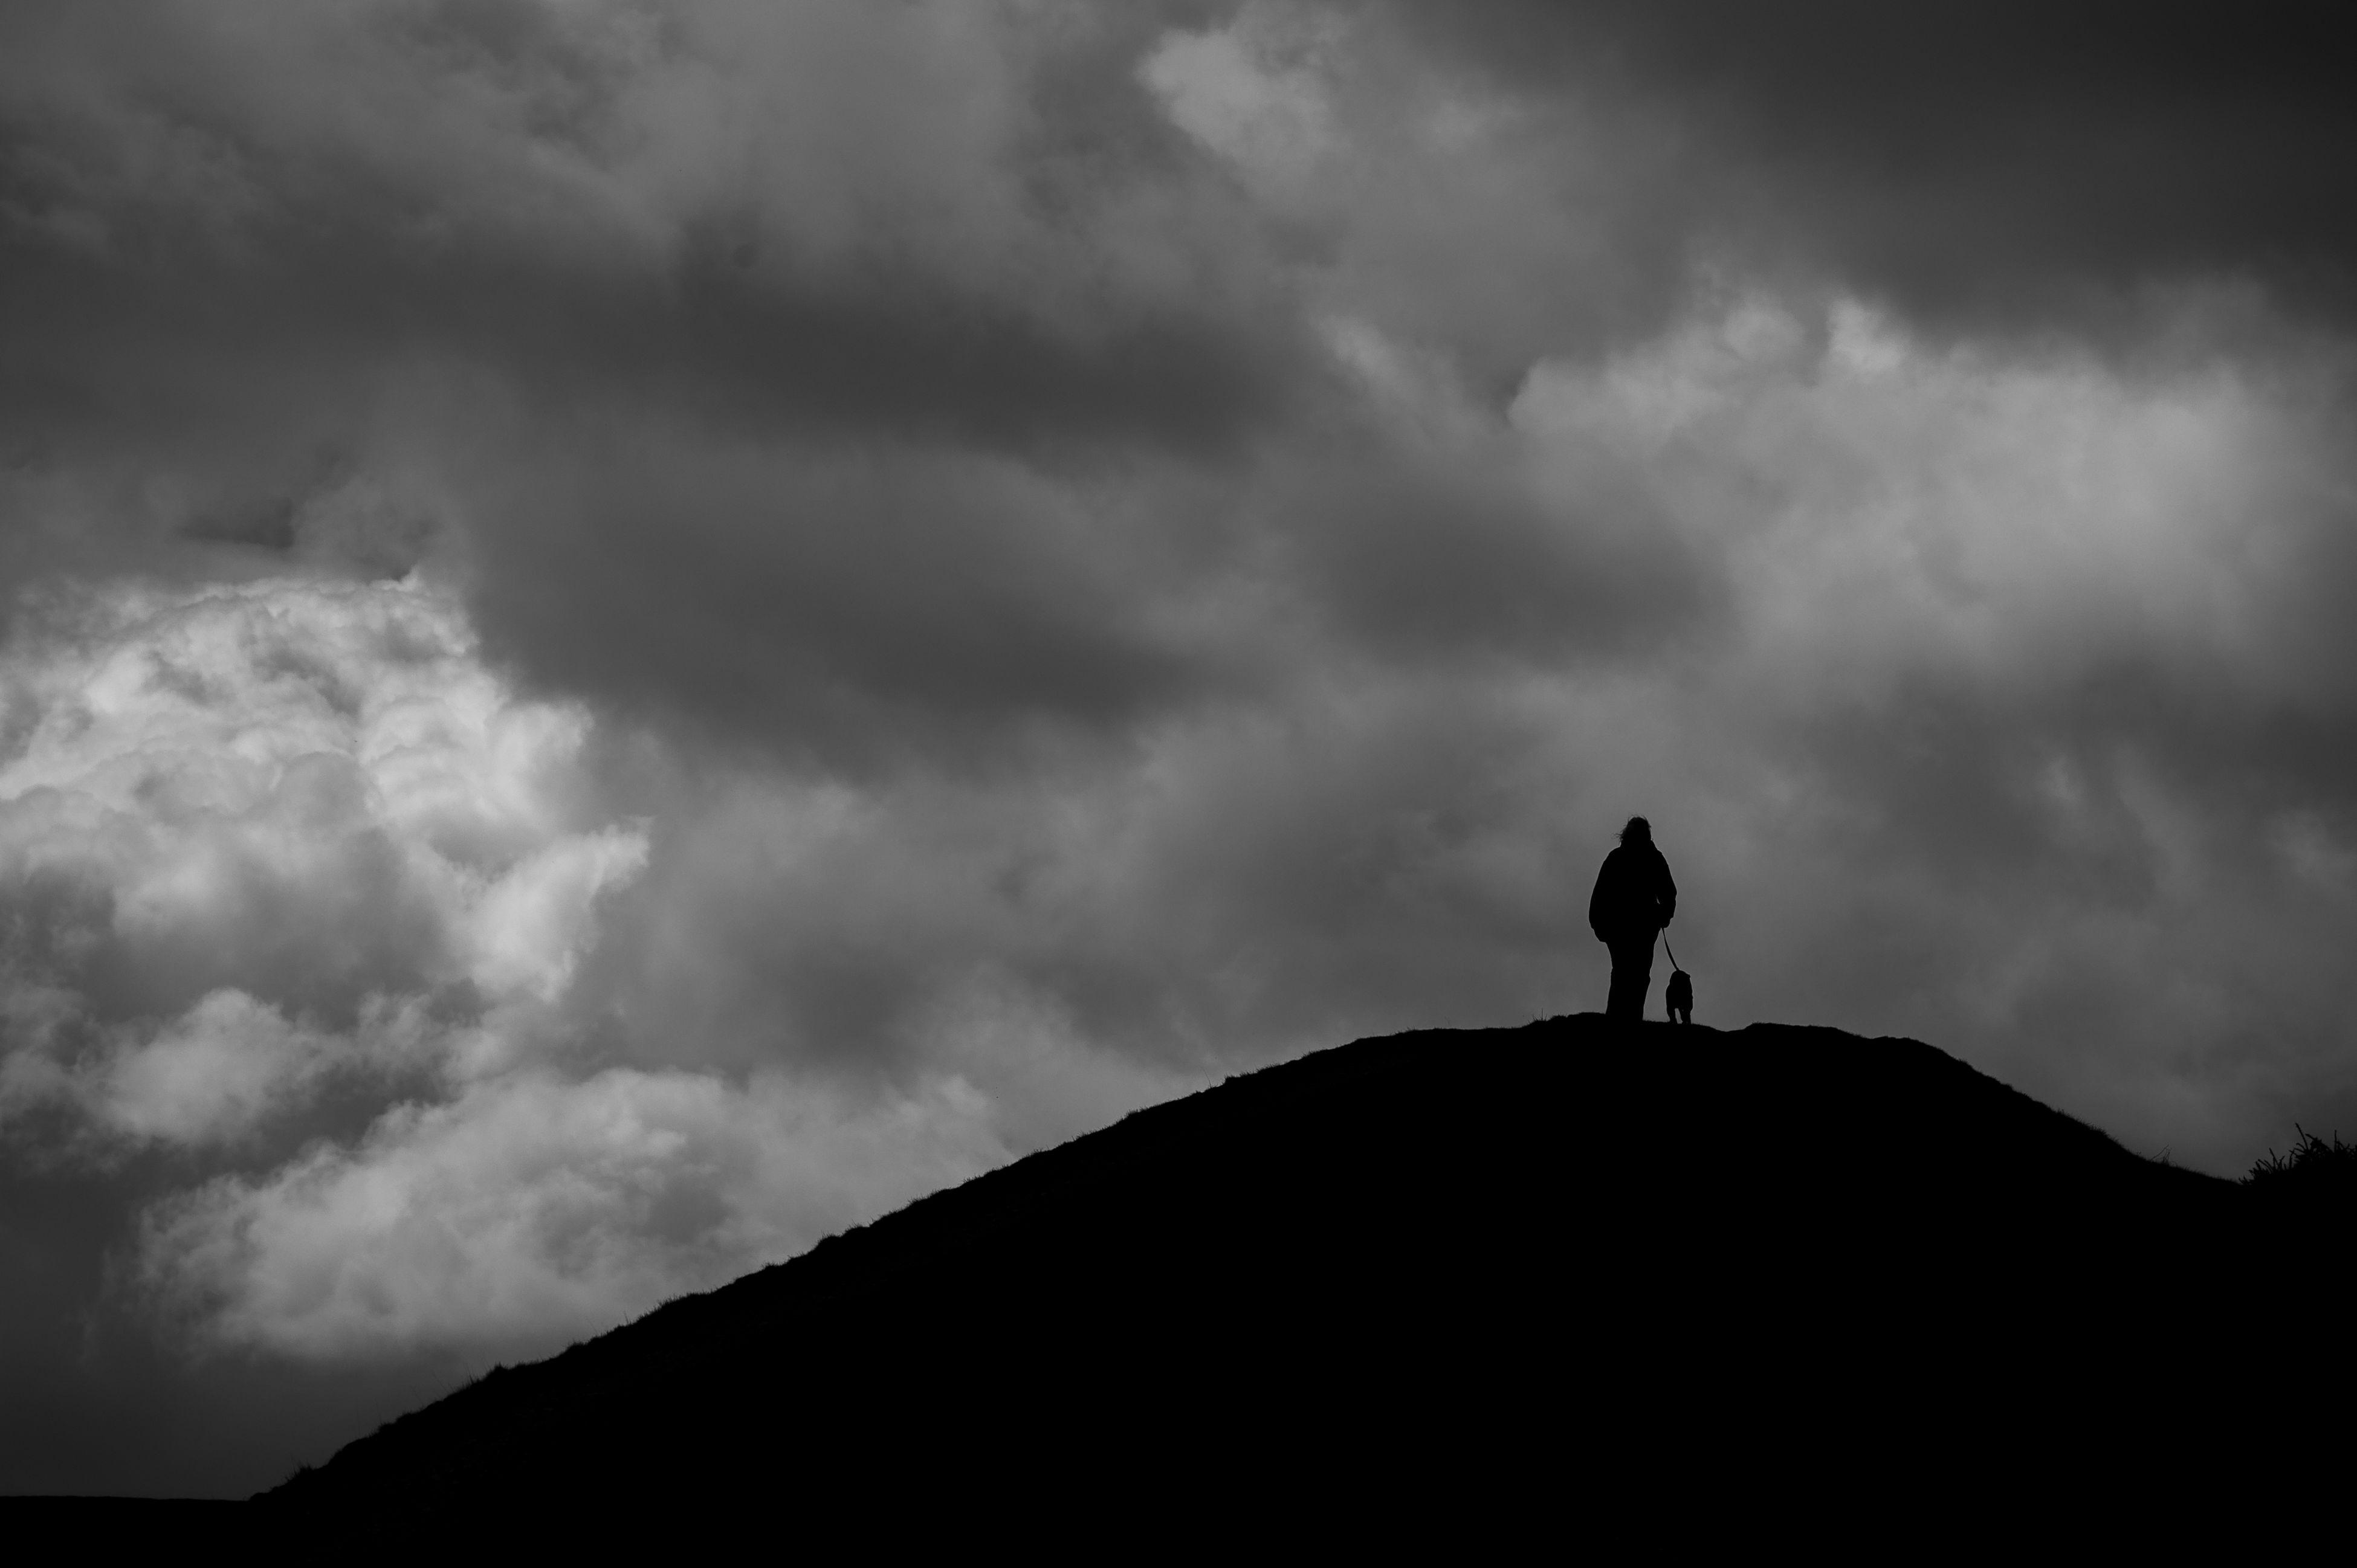 British Camp, Malvern. Silhouette Cloud - Sky Sky Nature One Person Dramatic Sky Landscape Outdoors Worcestershire Malvern British Camp Monochrome Black & White Blackandwhite Silhouette